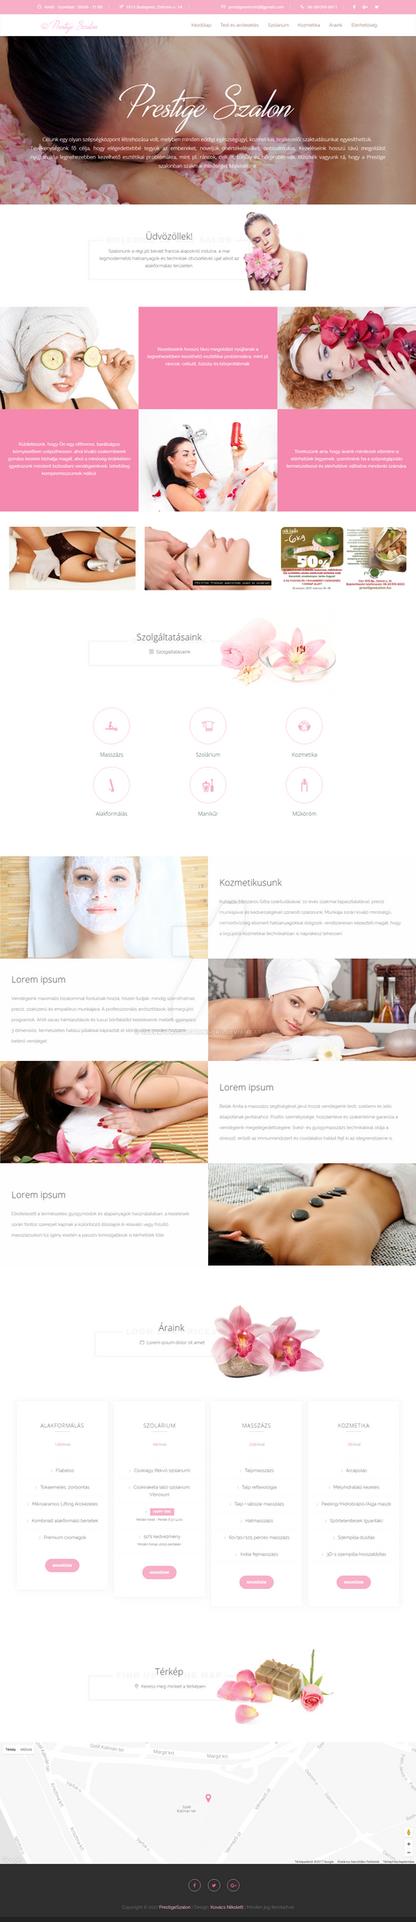 Beauty Salon Design Concept by cherryproductionsorg